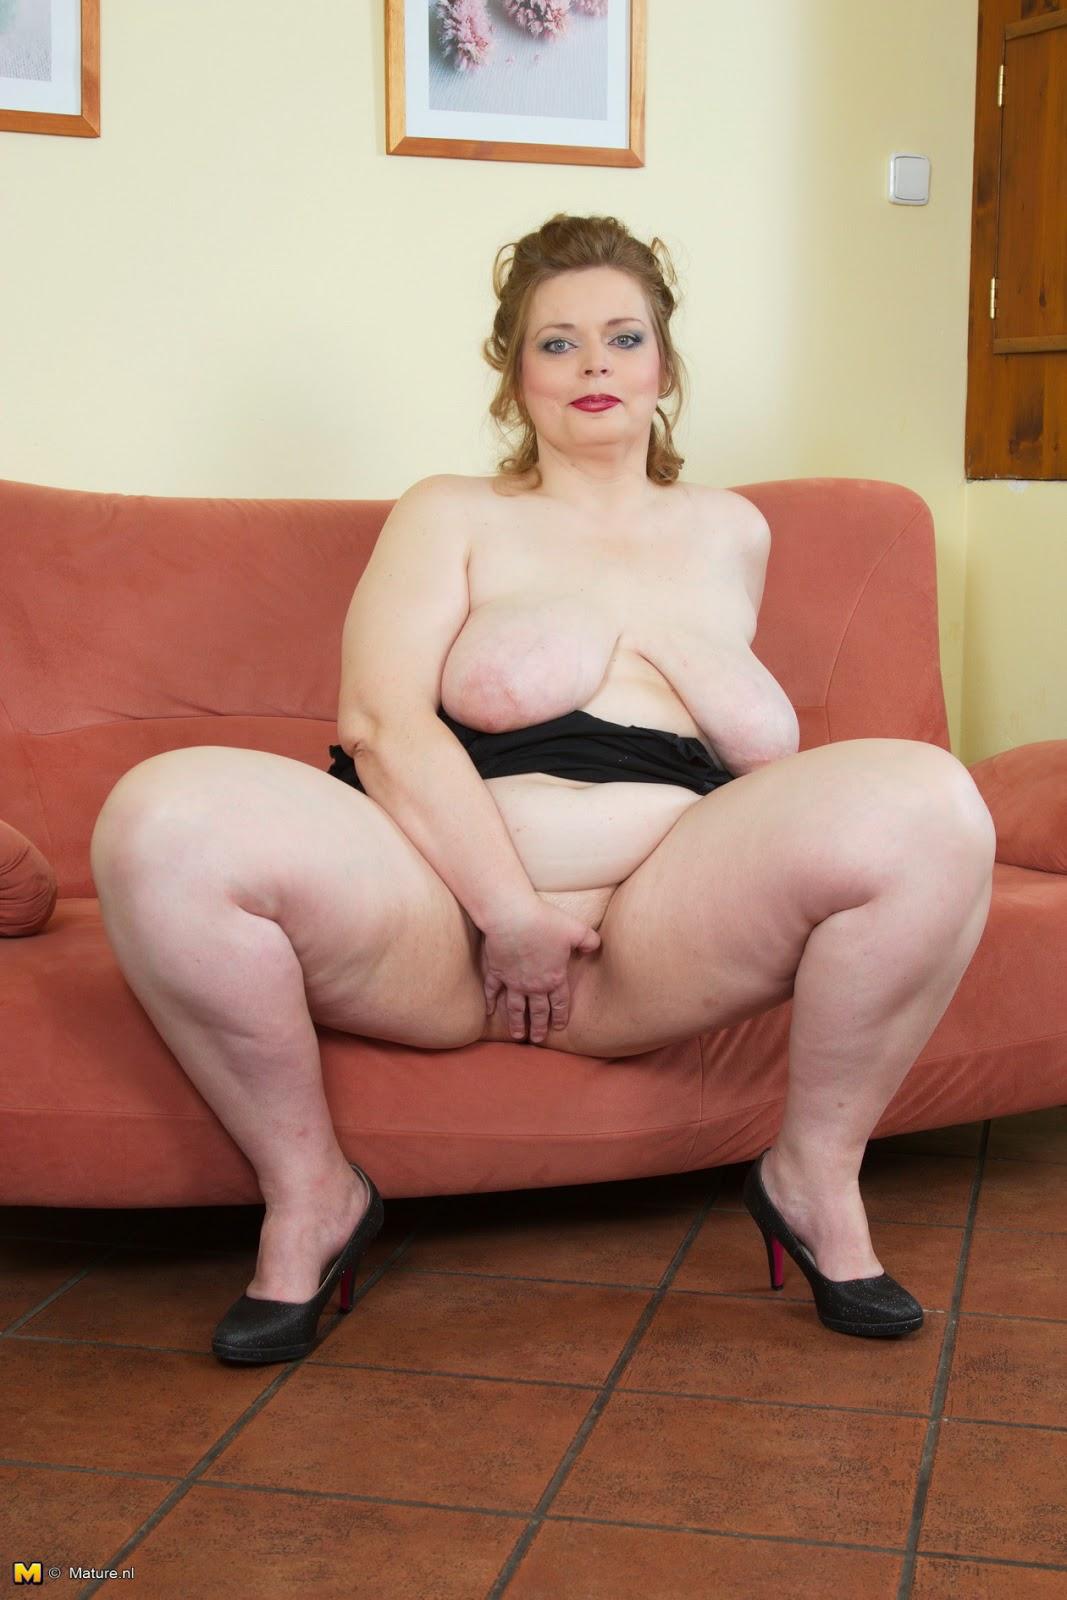 Super porn young pre nude